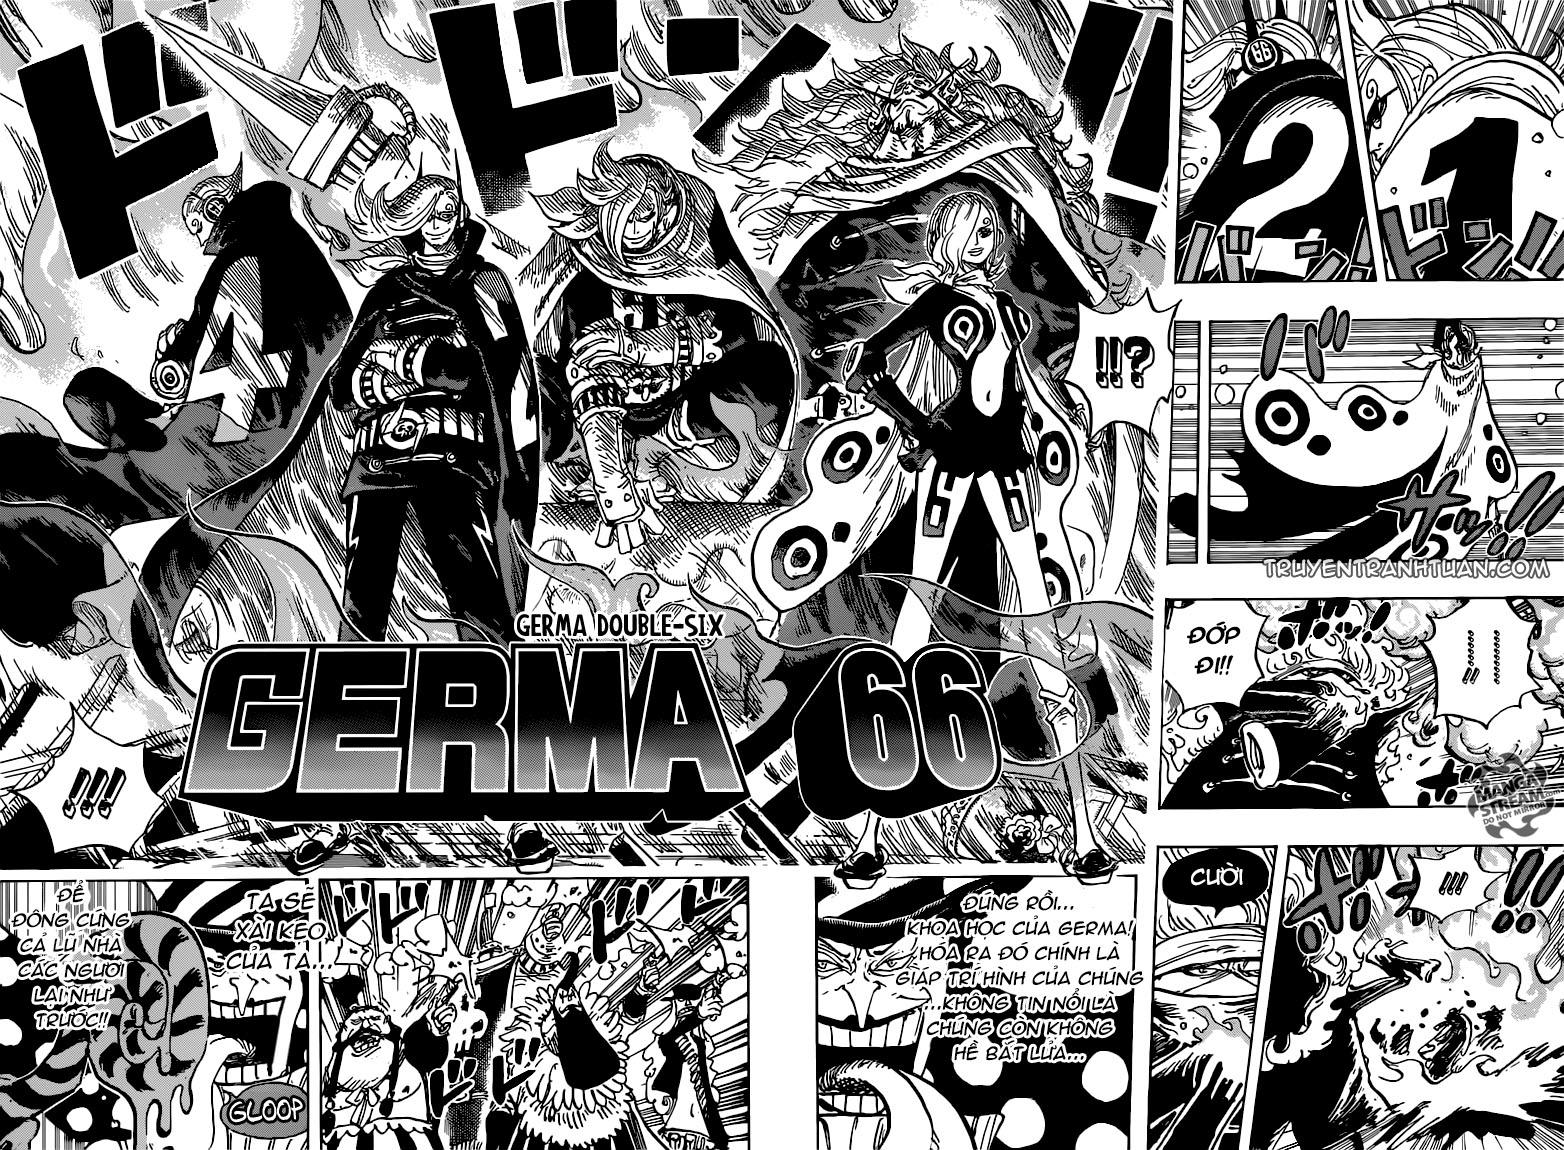 One Piece - Đảo Hải Tặc trang 11